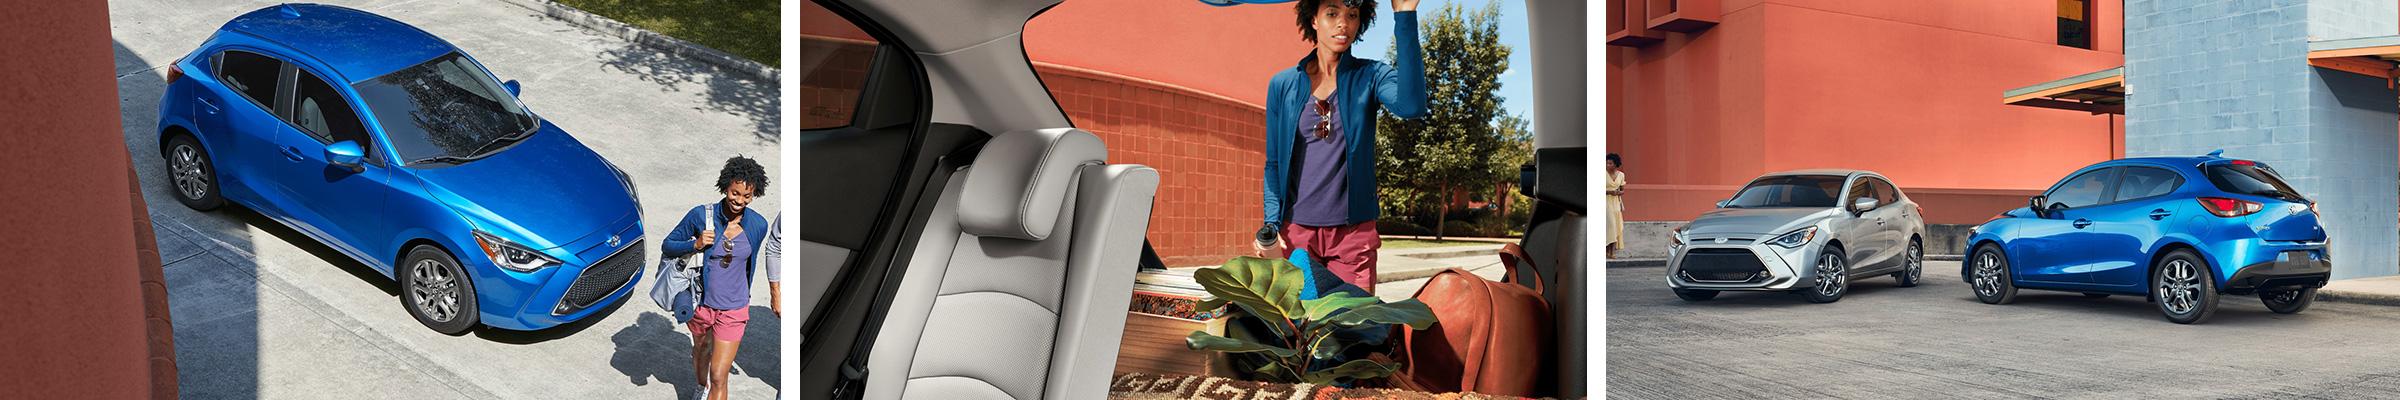 2020 Toyota Yaris Hatchback For Sale Austin TX | Bastrop